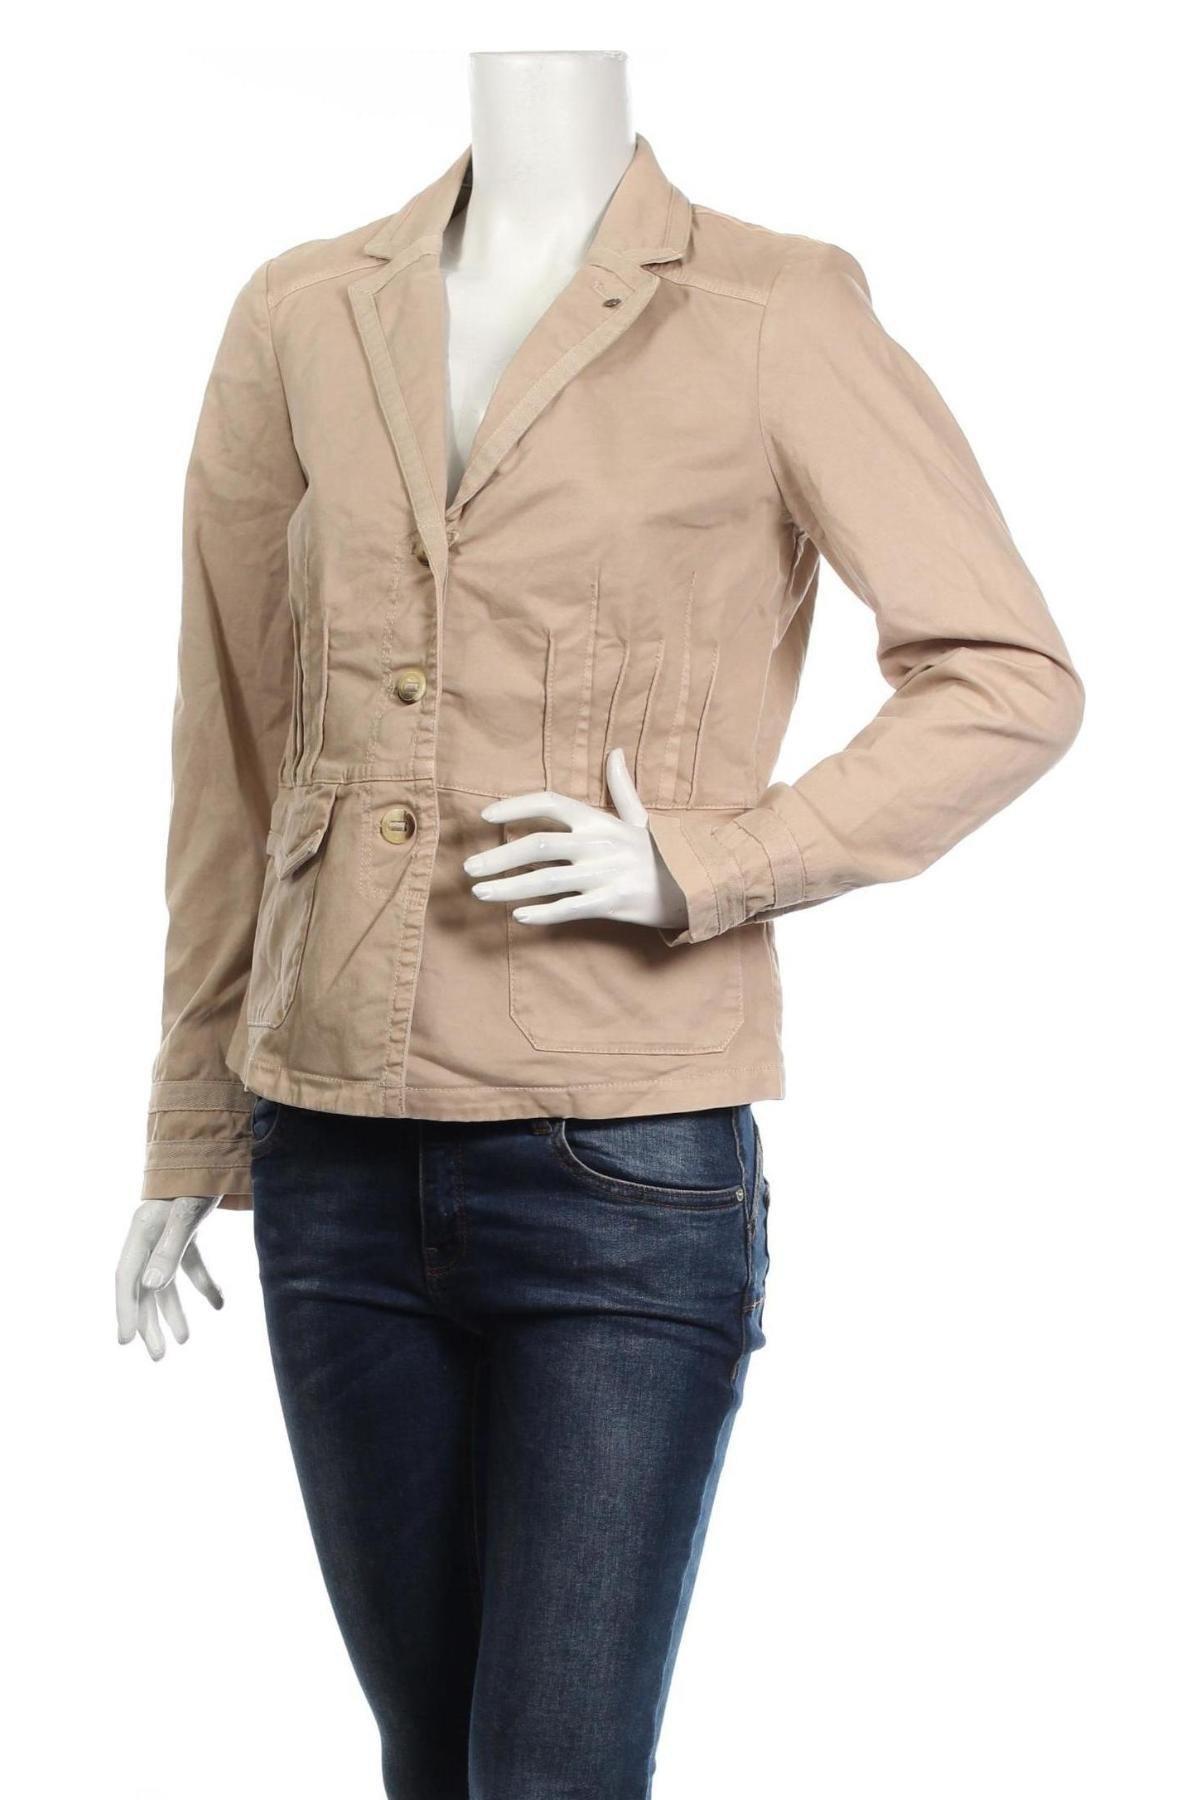 Дамско яке Tom Tailor, Размер M, Цвят Бежов, 97% памук, 3% еластан, Цена 55,65лв.